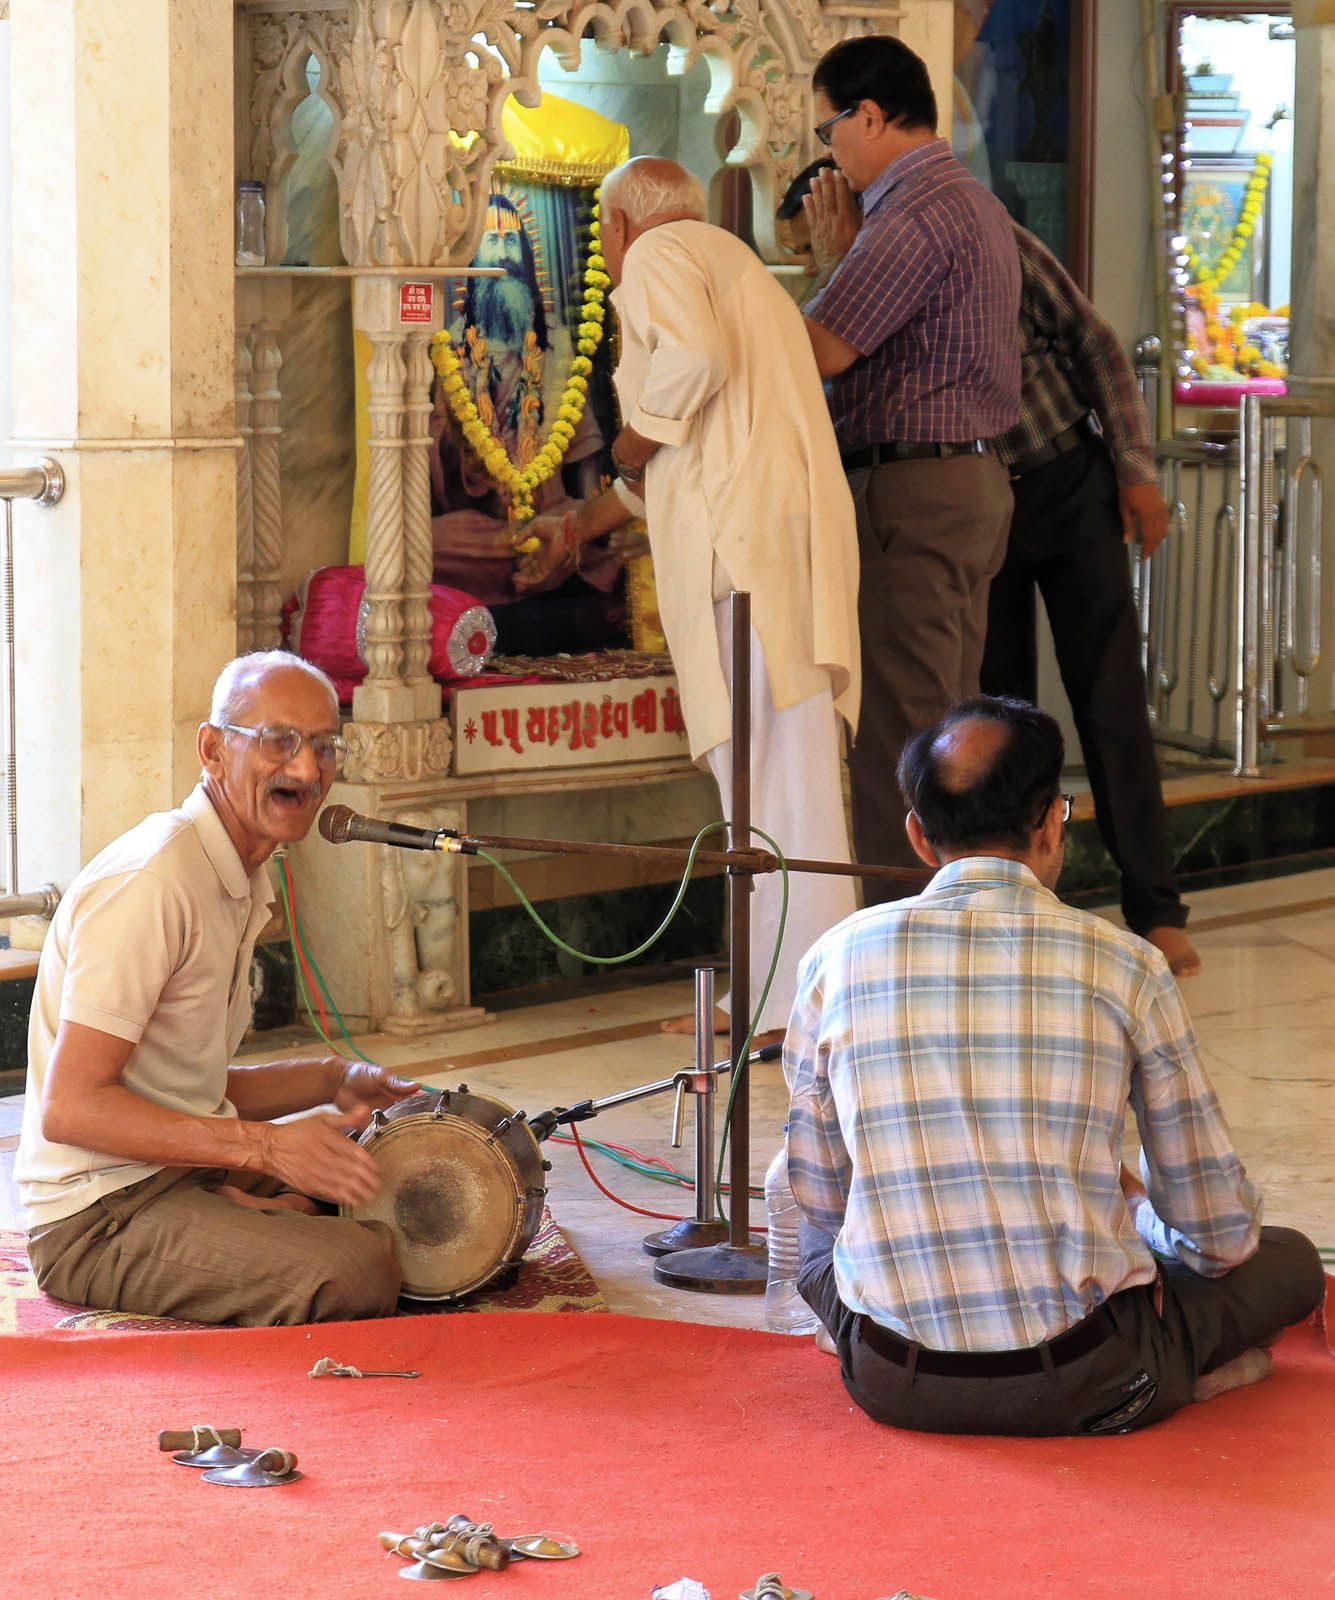 1031_Jamnagar_Bala-Hanuman-Temple-4.jpg